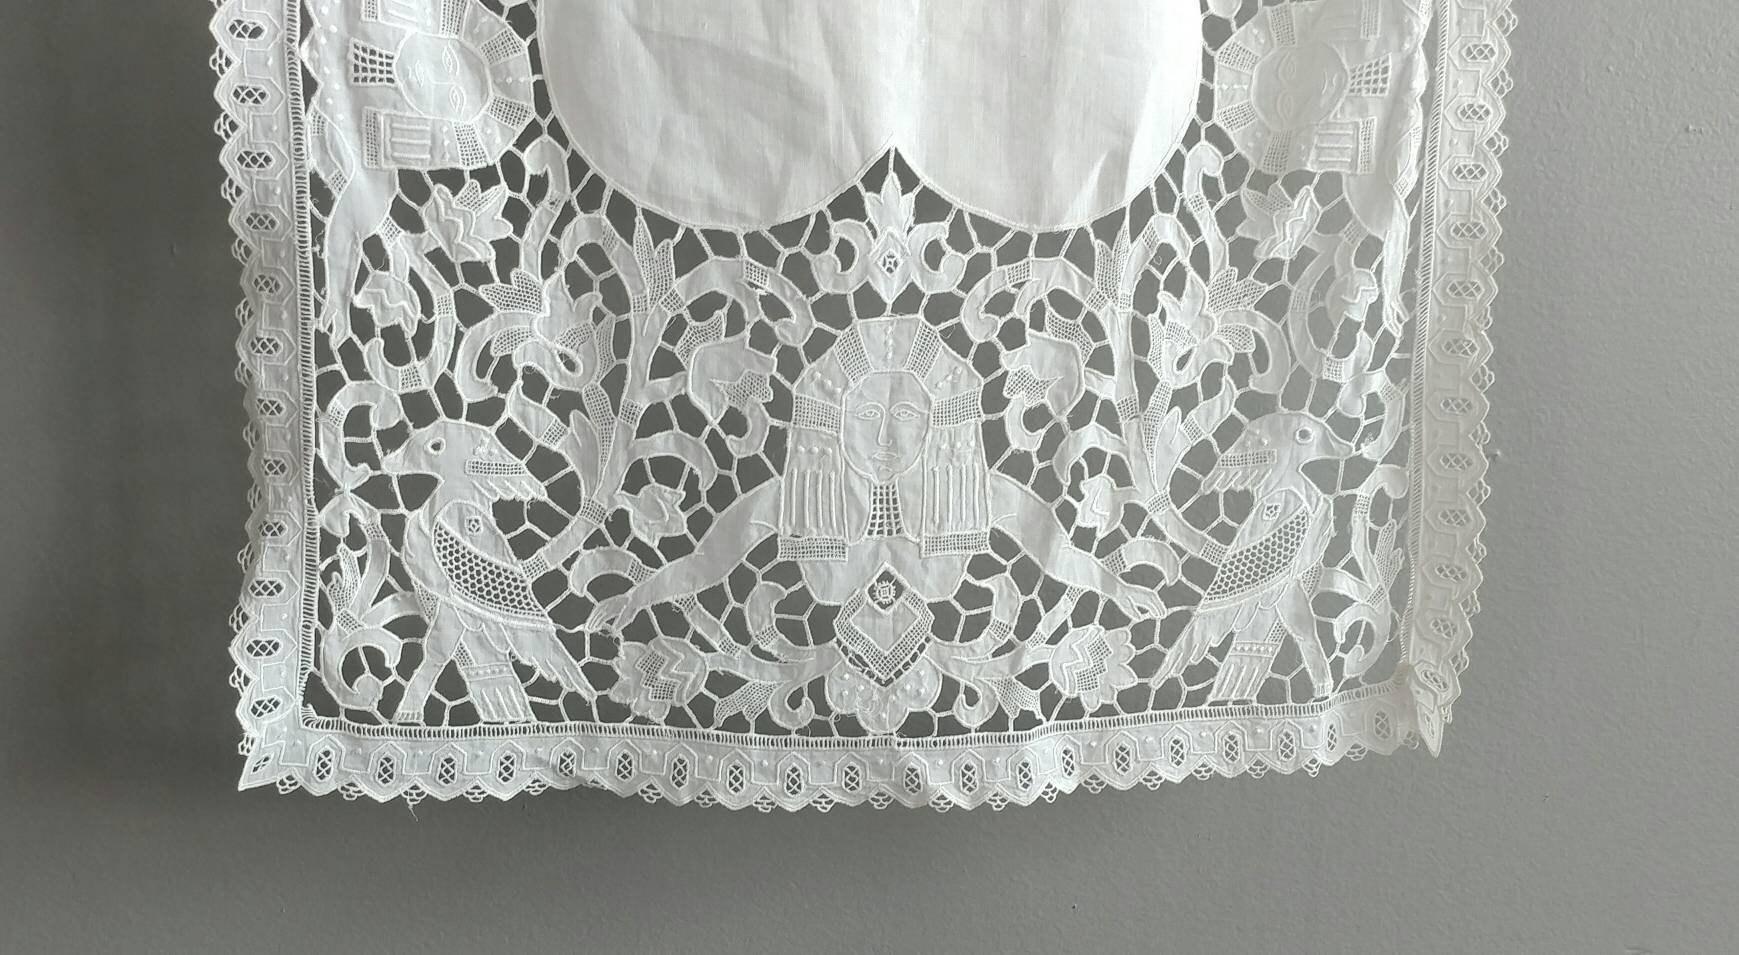 Egyptian Revival dentelle Runner coton égyptien Sphinx dentelle blanche blanche blanche à la main Vintage Lin Lin caractères égyptiens Textiles Vintage Egypte cebd0c